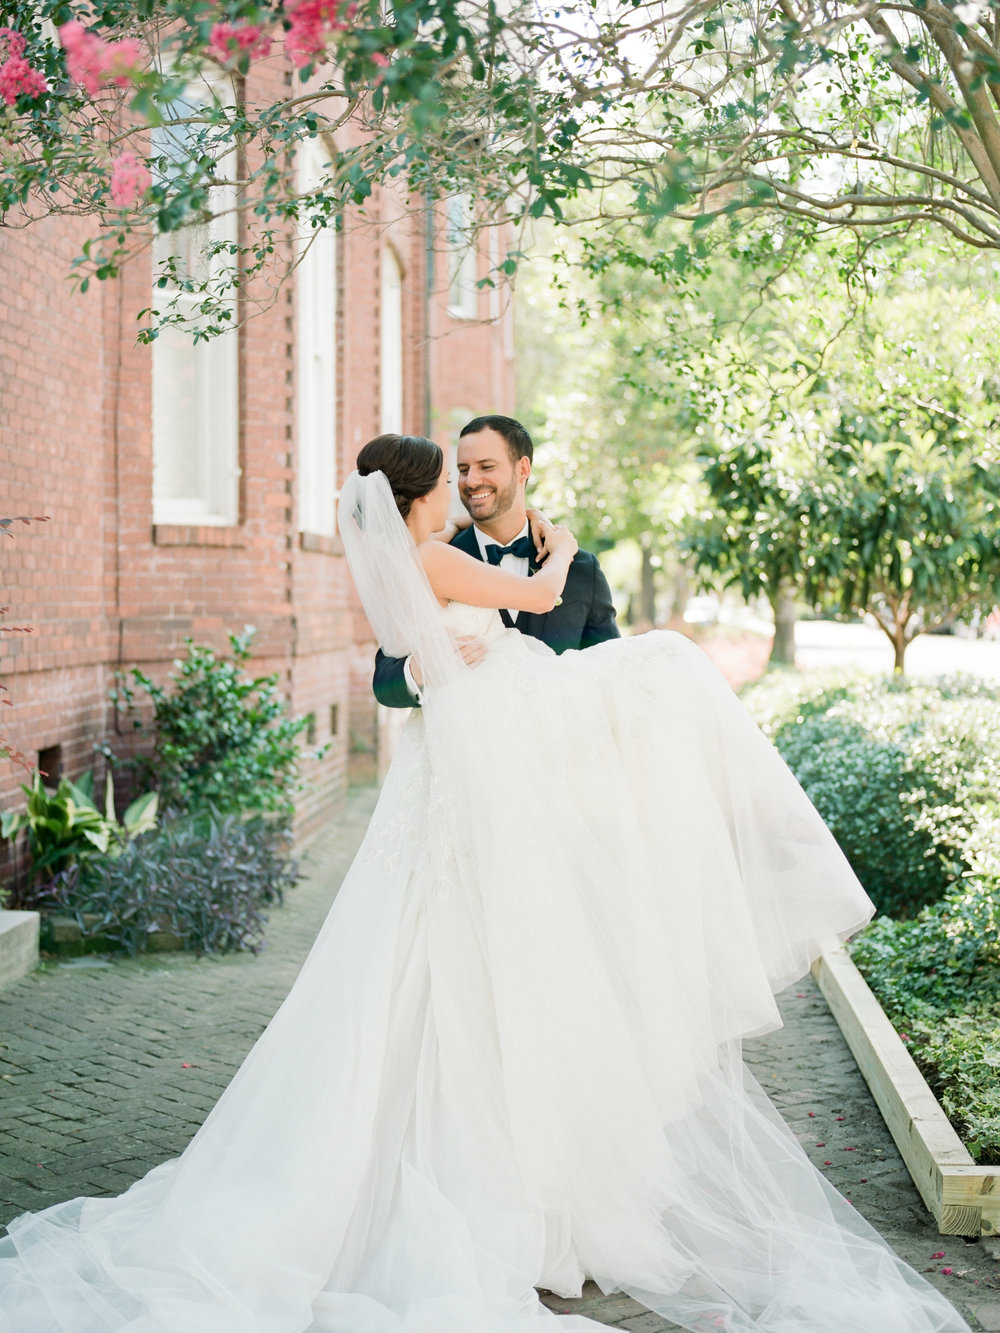 mckenzie_and_andrew_savannah_wedding_photographer_shannon_griffin_bride_and_groom-36.jpg